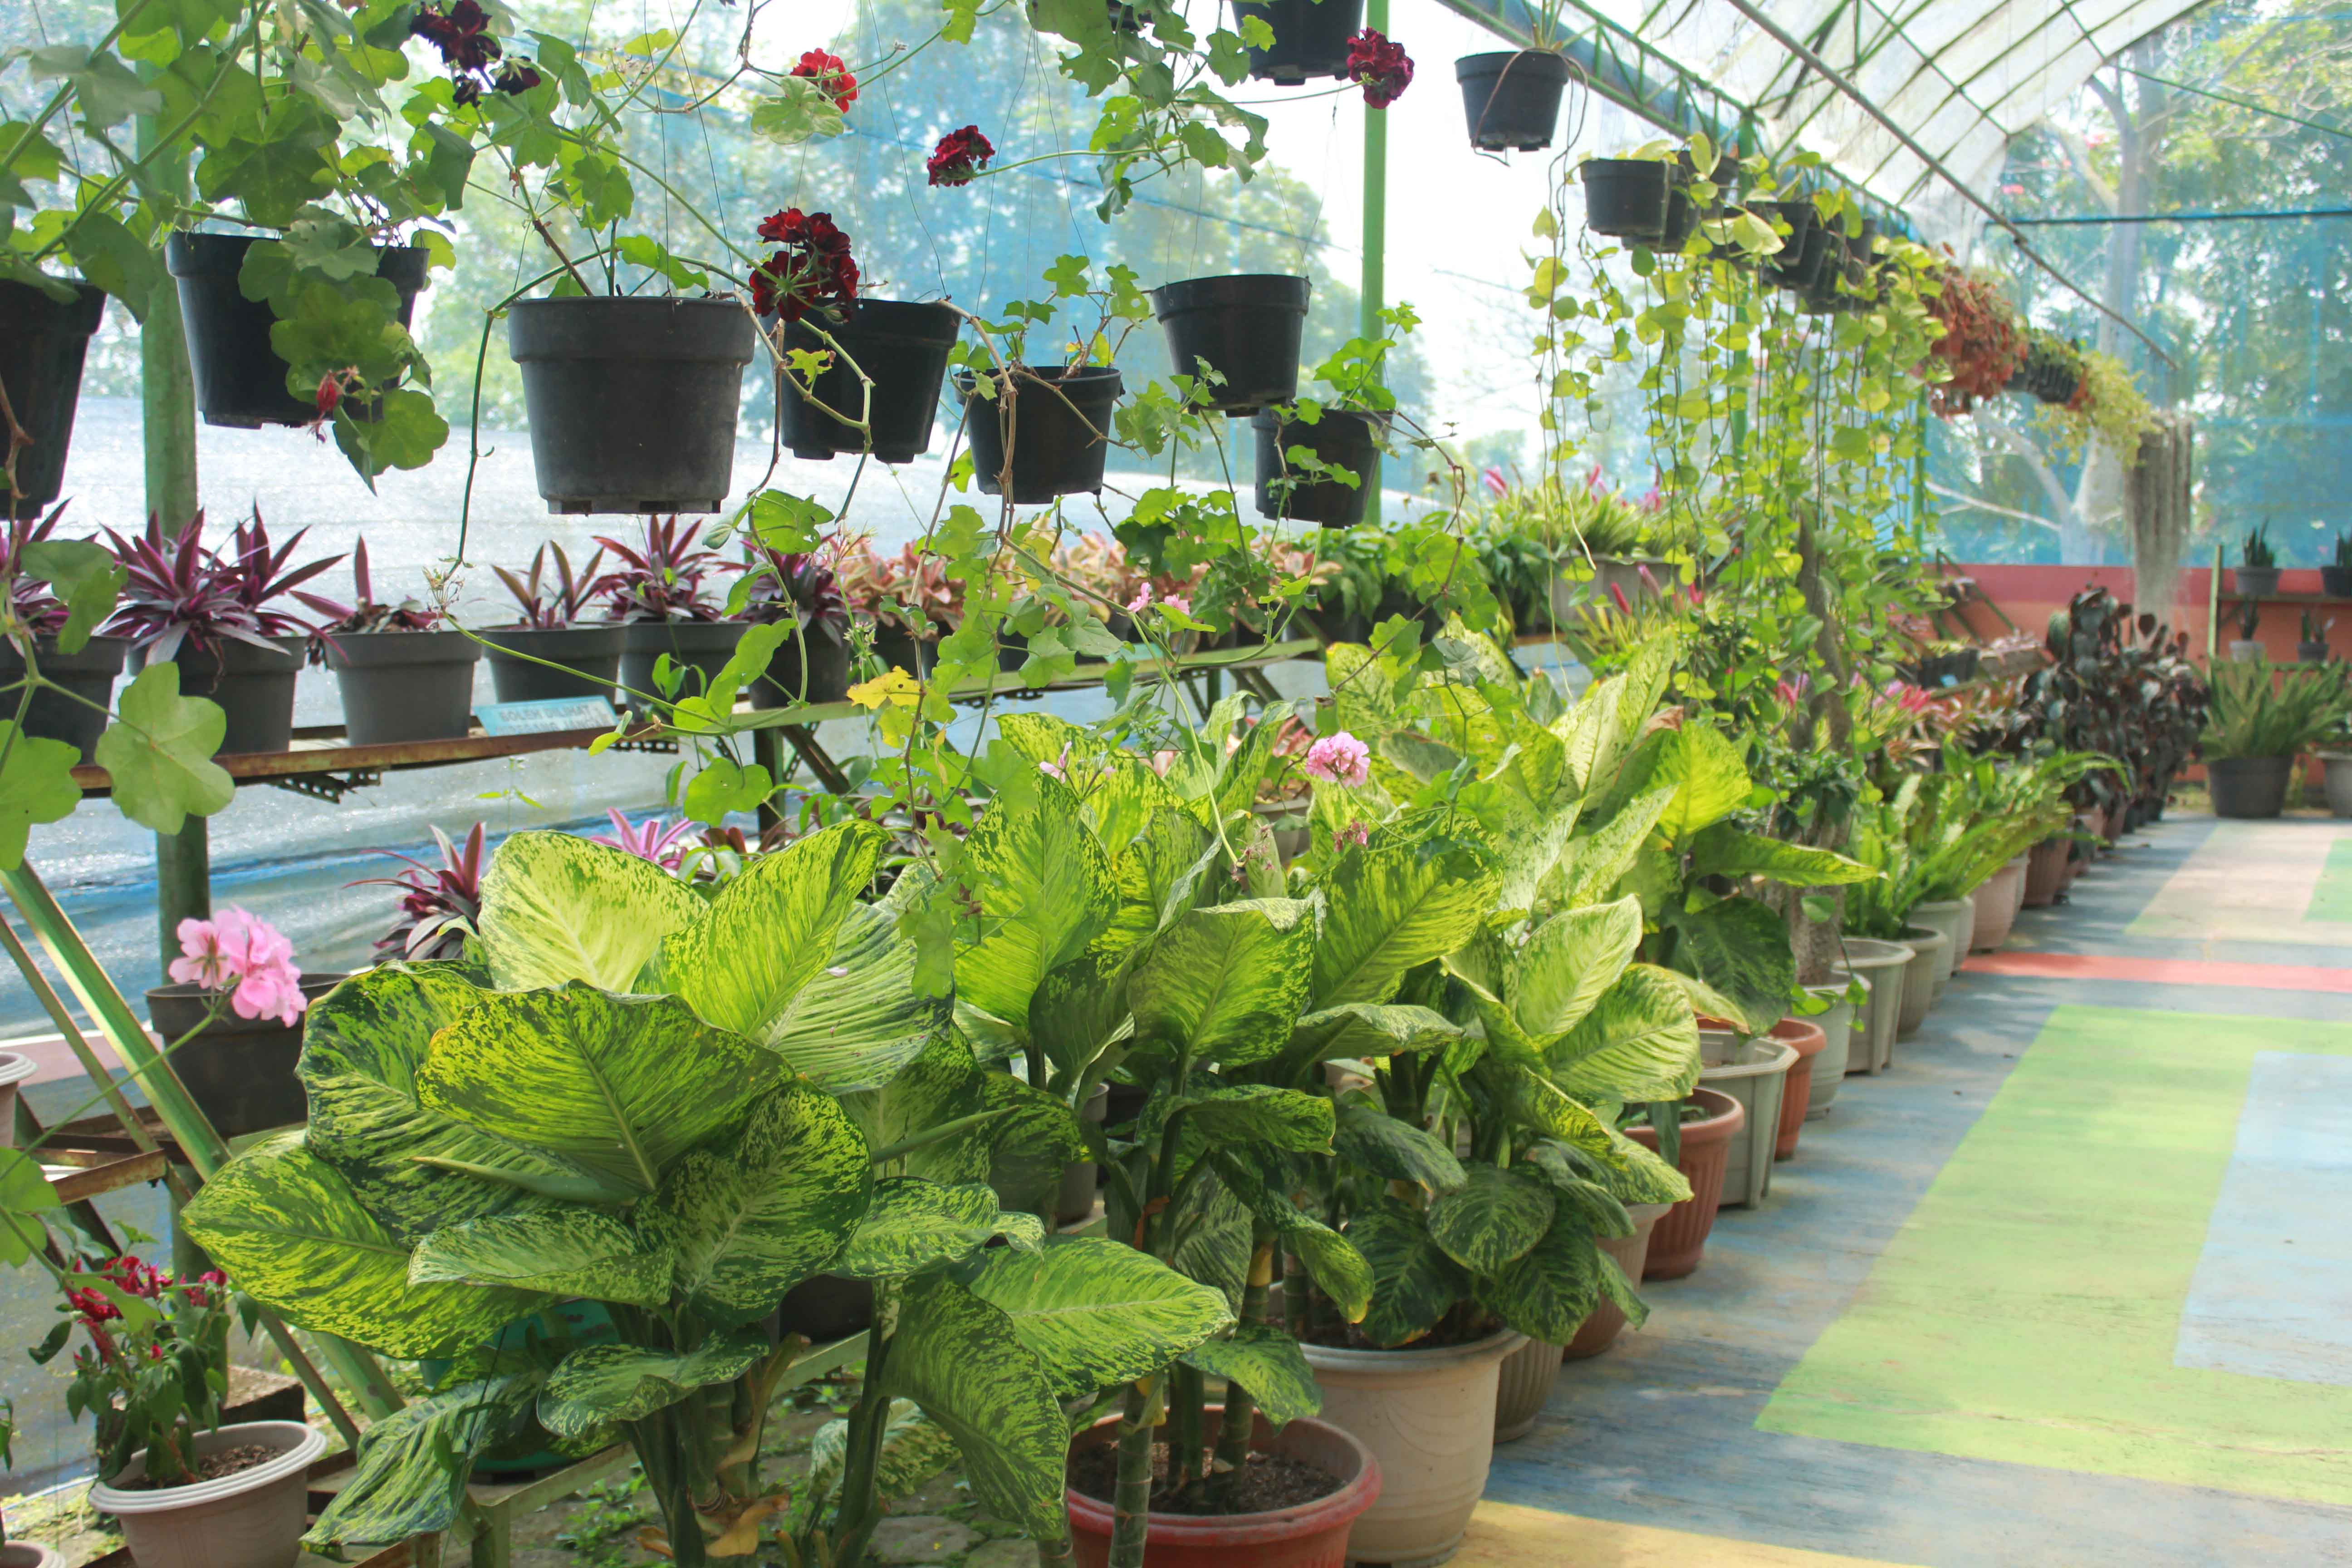 Wisata Bukit Flora Blog Museum Online Kabupaten Pasuruan Img 1786